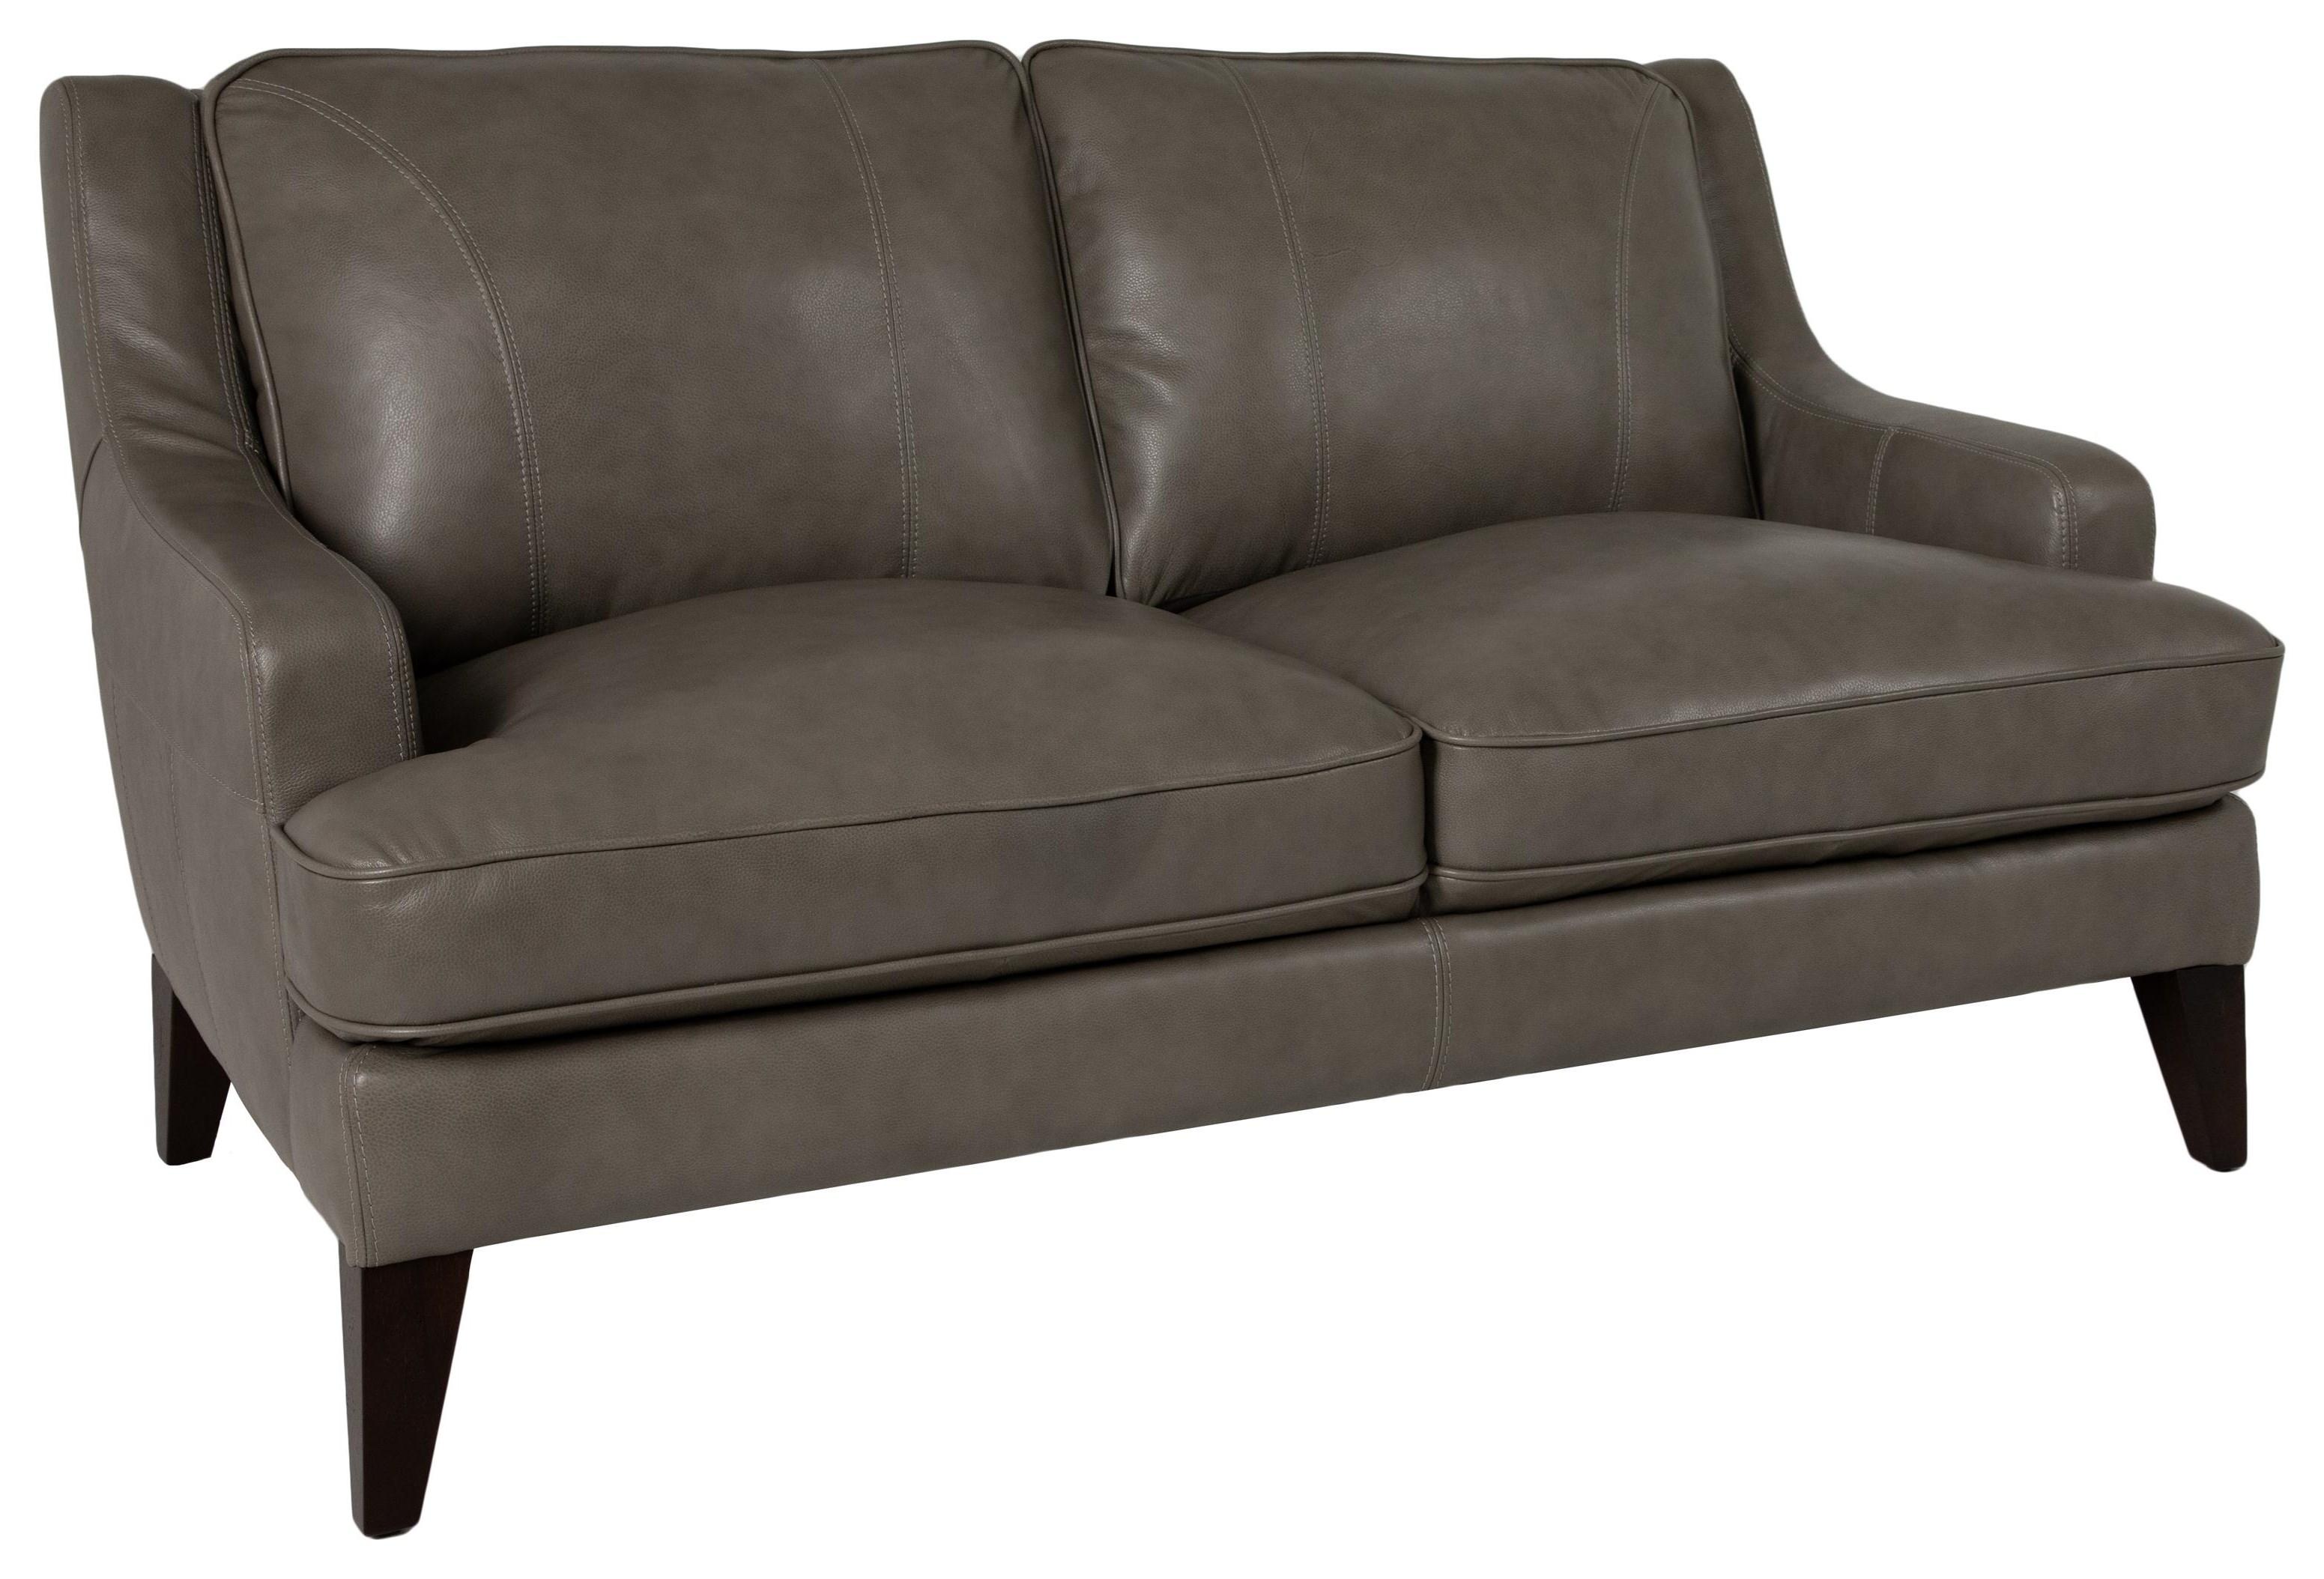 Stallion Leather Loveseat at Walker's Furniture